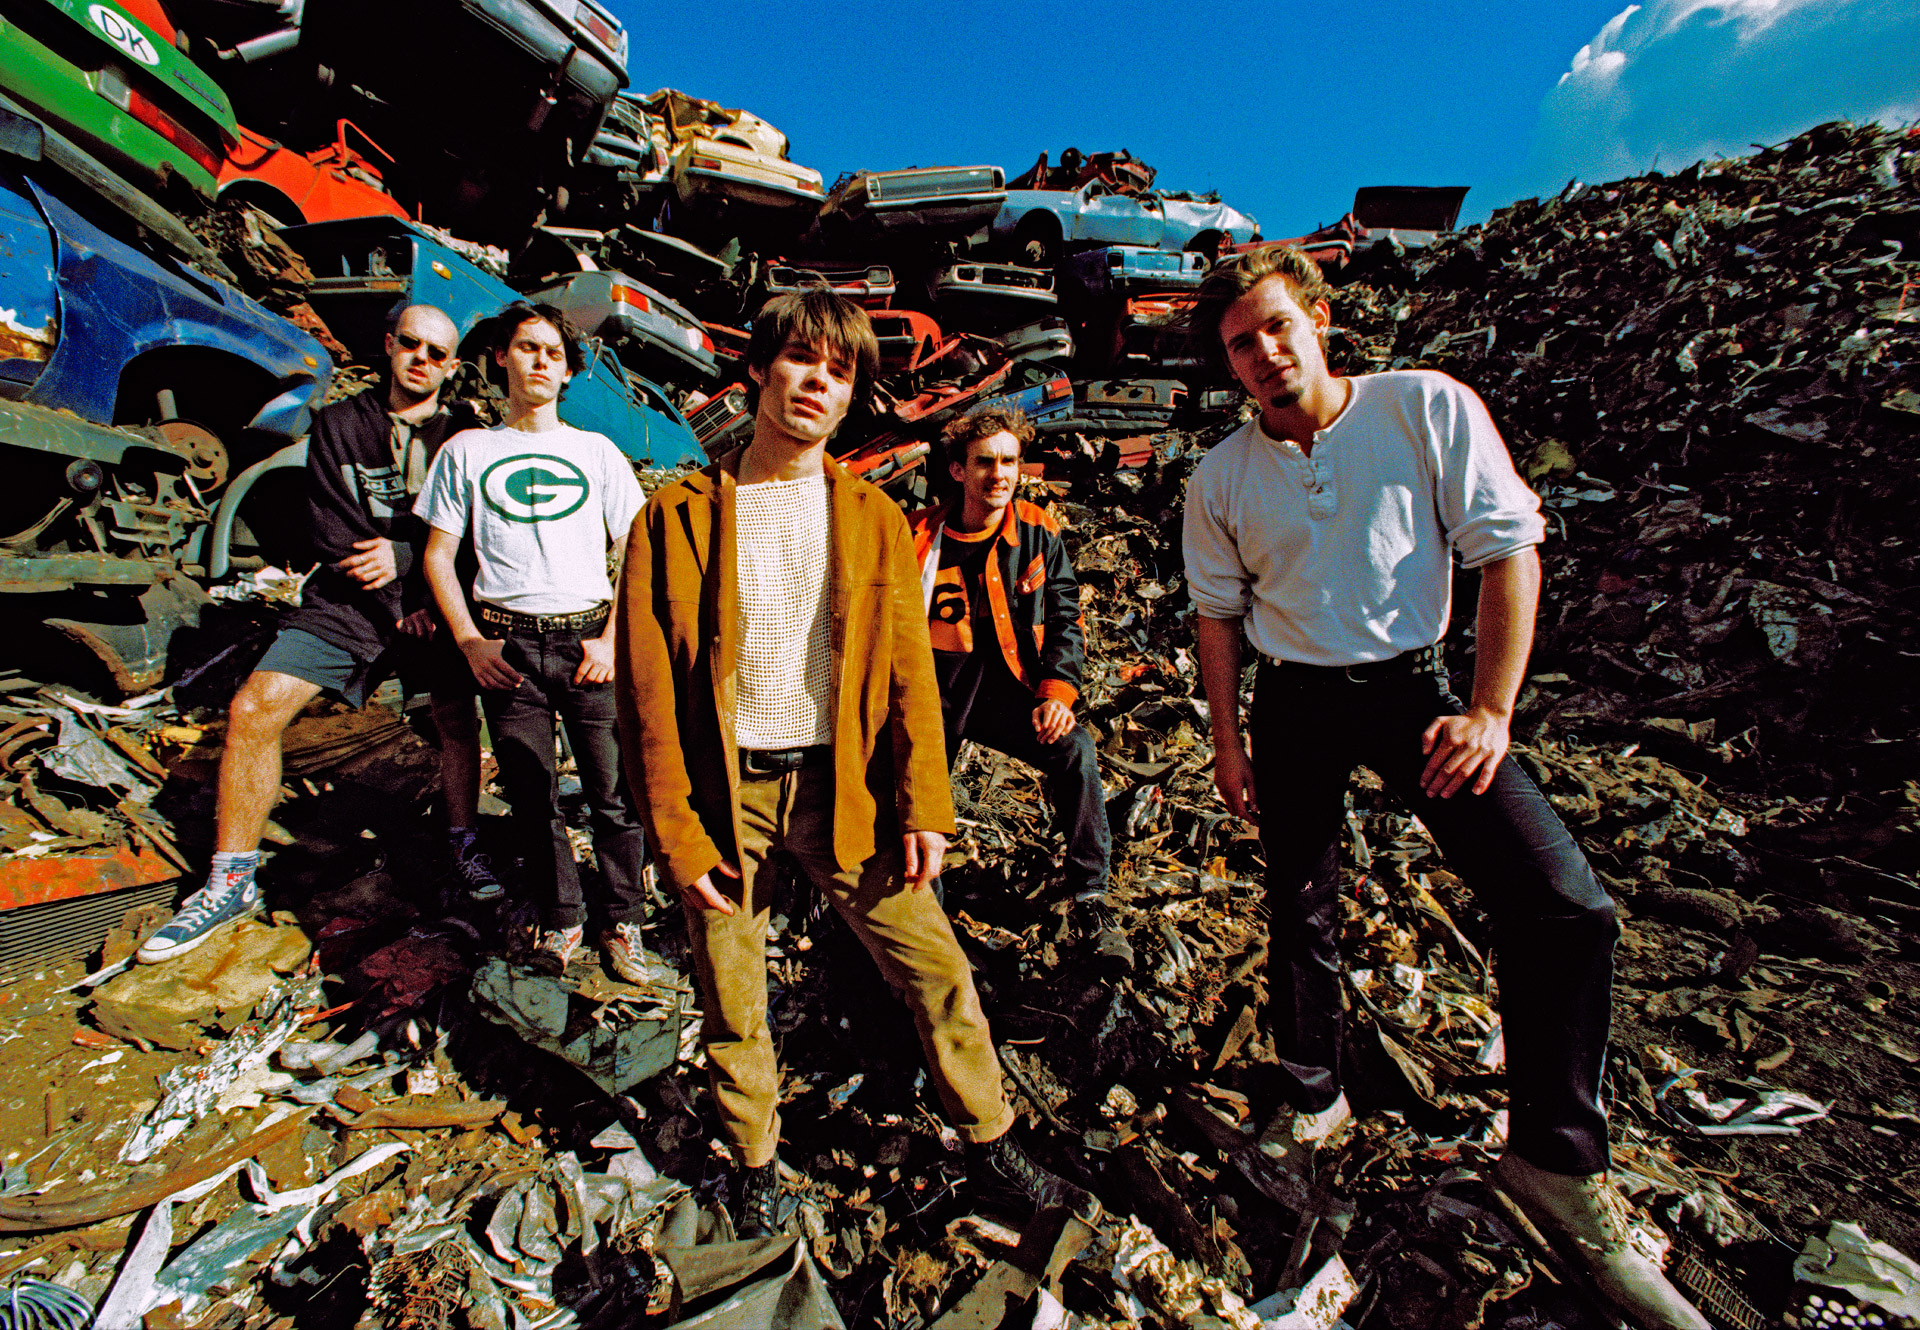 A Danish rock band at a car dump in Sydhavnen in Copenhagen